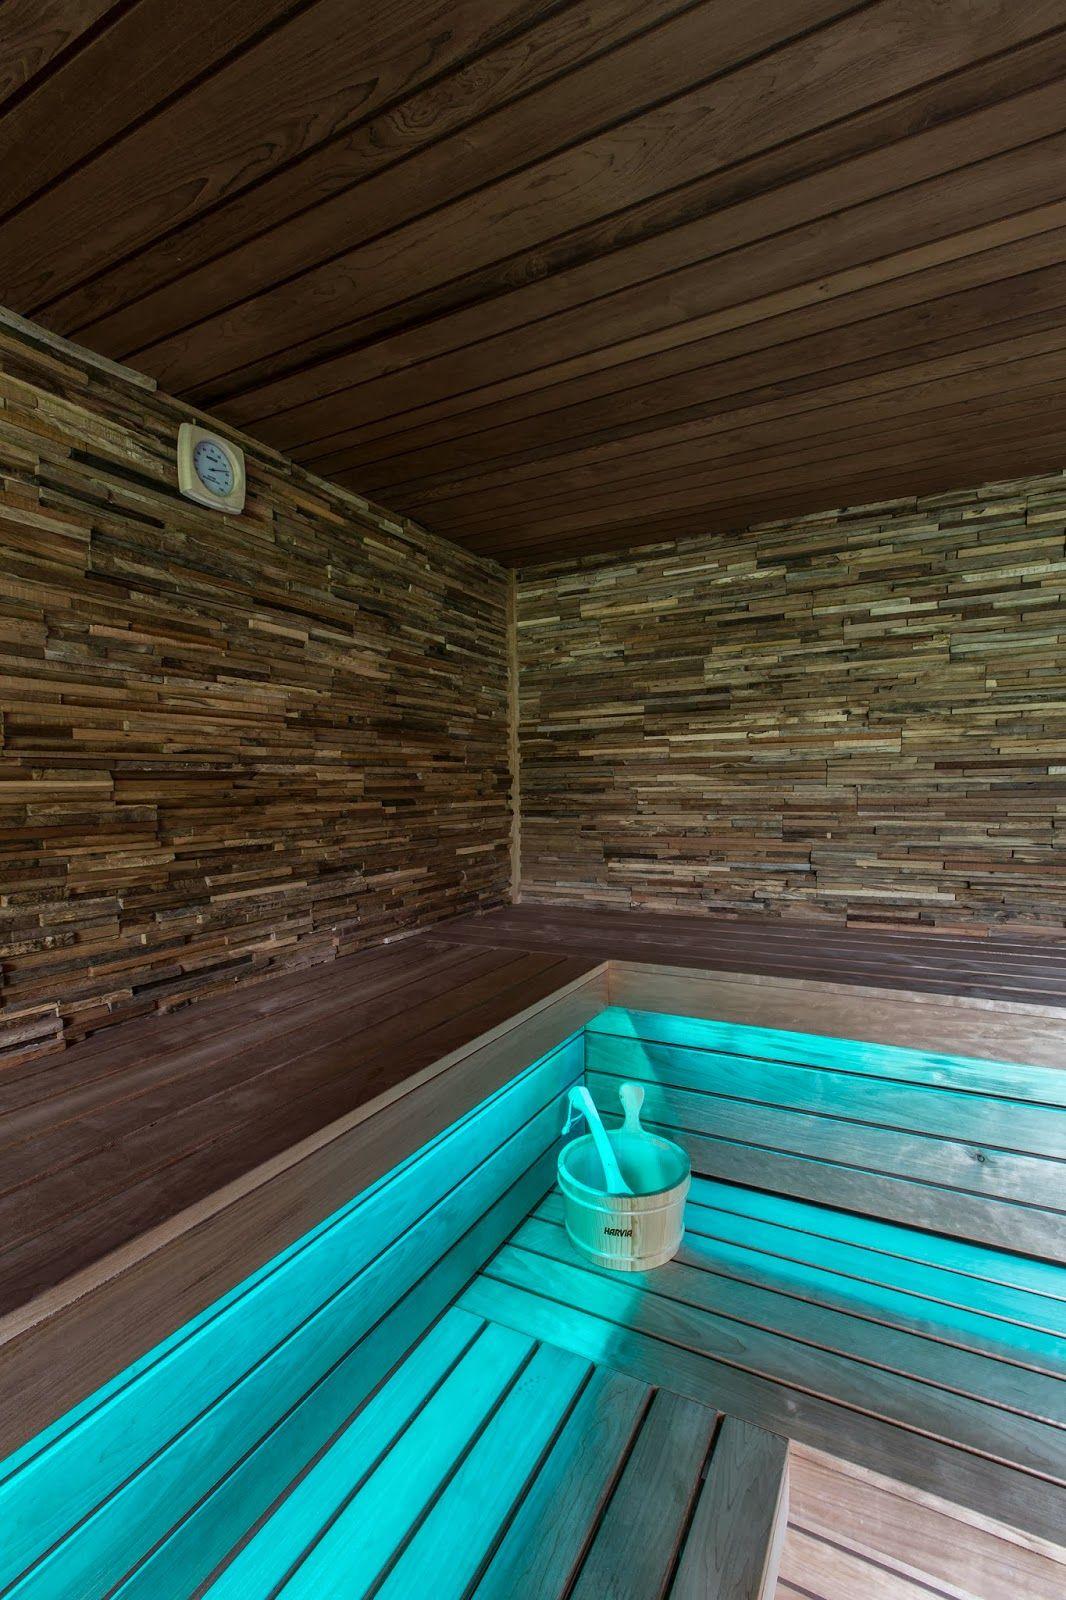 sauna met led verlichting sauna ideas saunas interior design wellness room